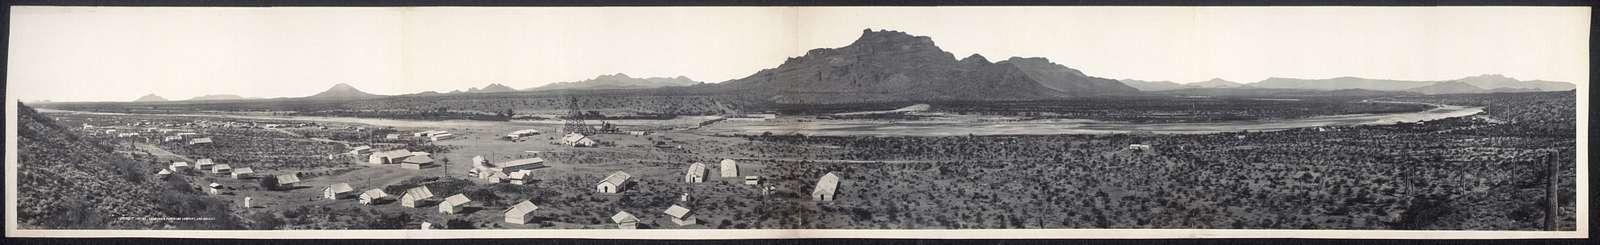 Diversion Dam via Mesa, Arizona